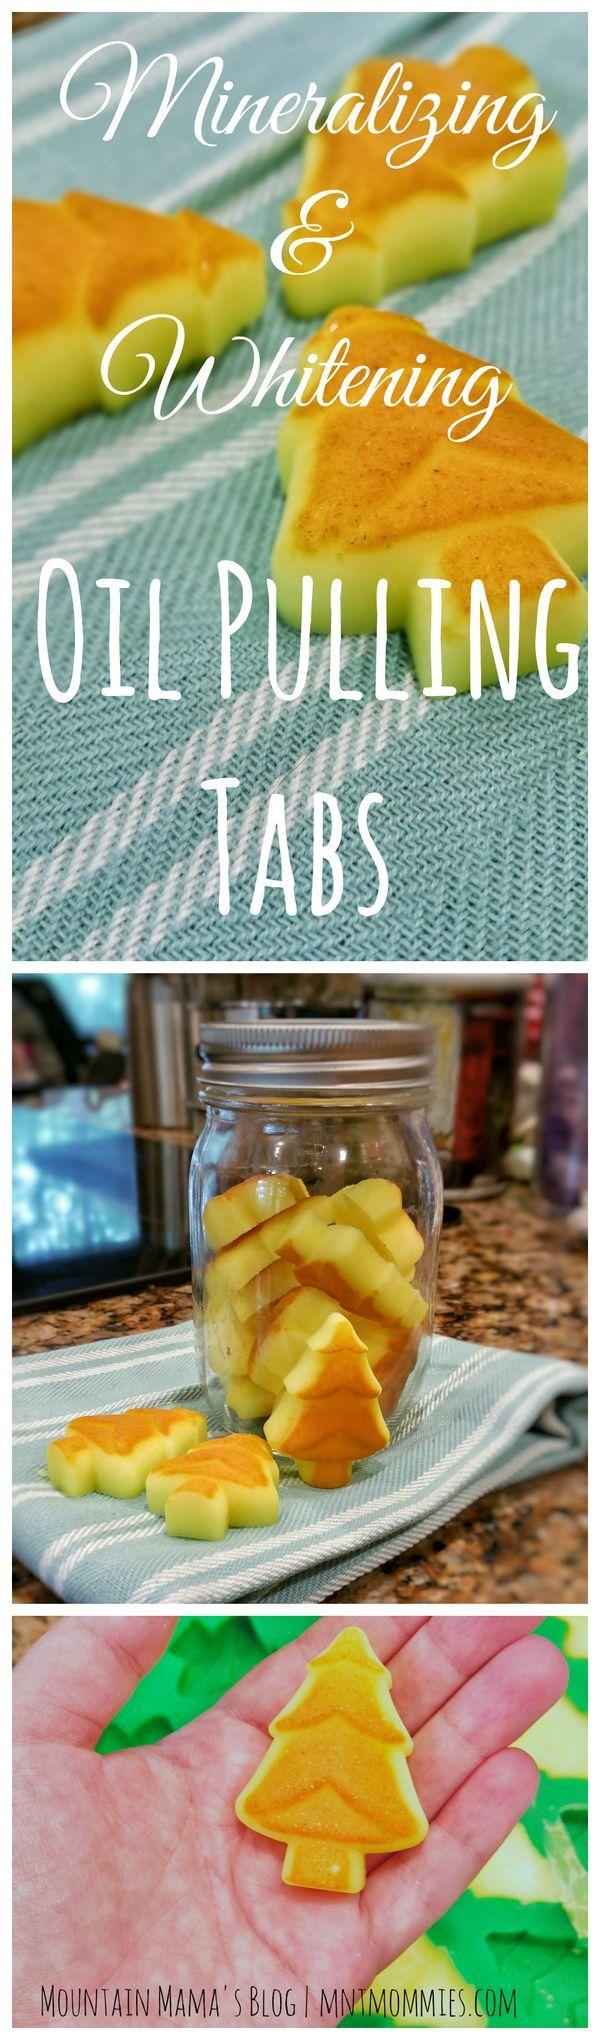 DIY Mineralizing & Whitening Oil Pulling Tabs   Mountain Mama's Blog   mntmommies.com #teeth #recipe